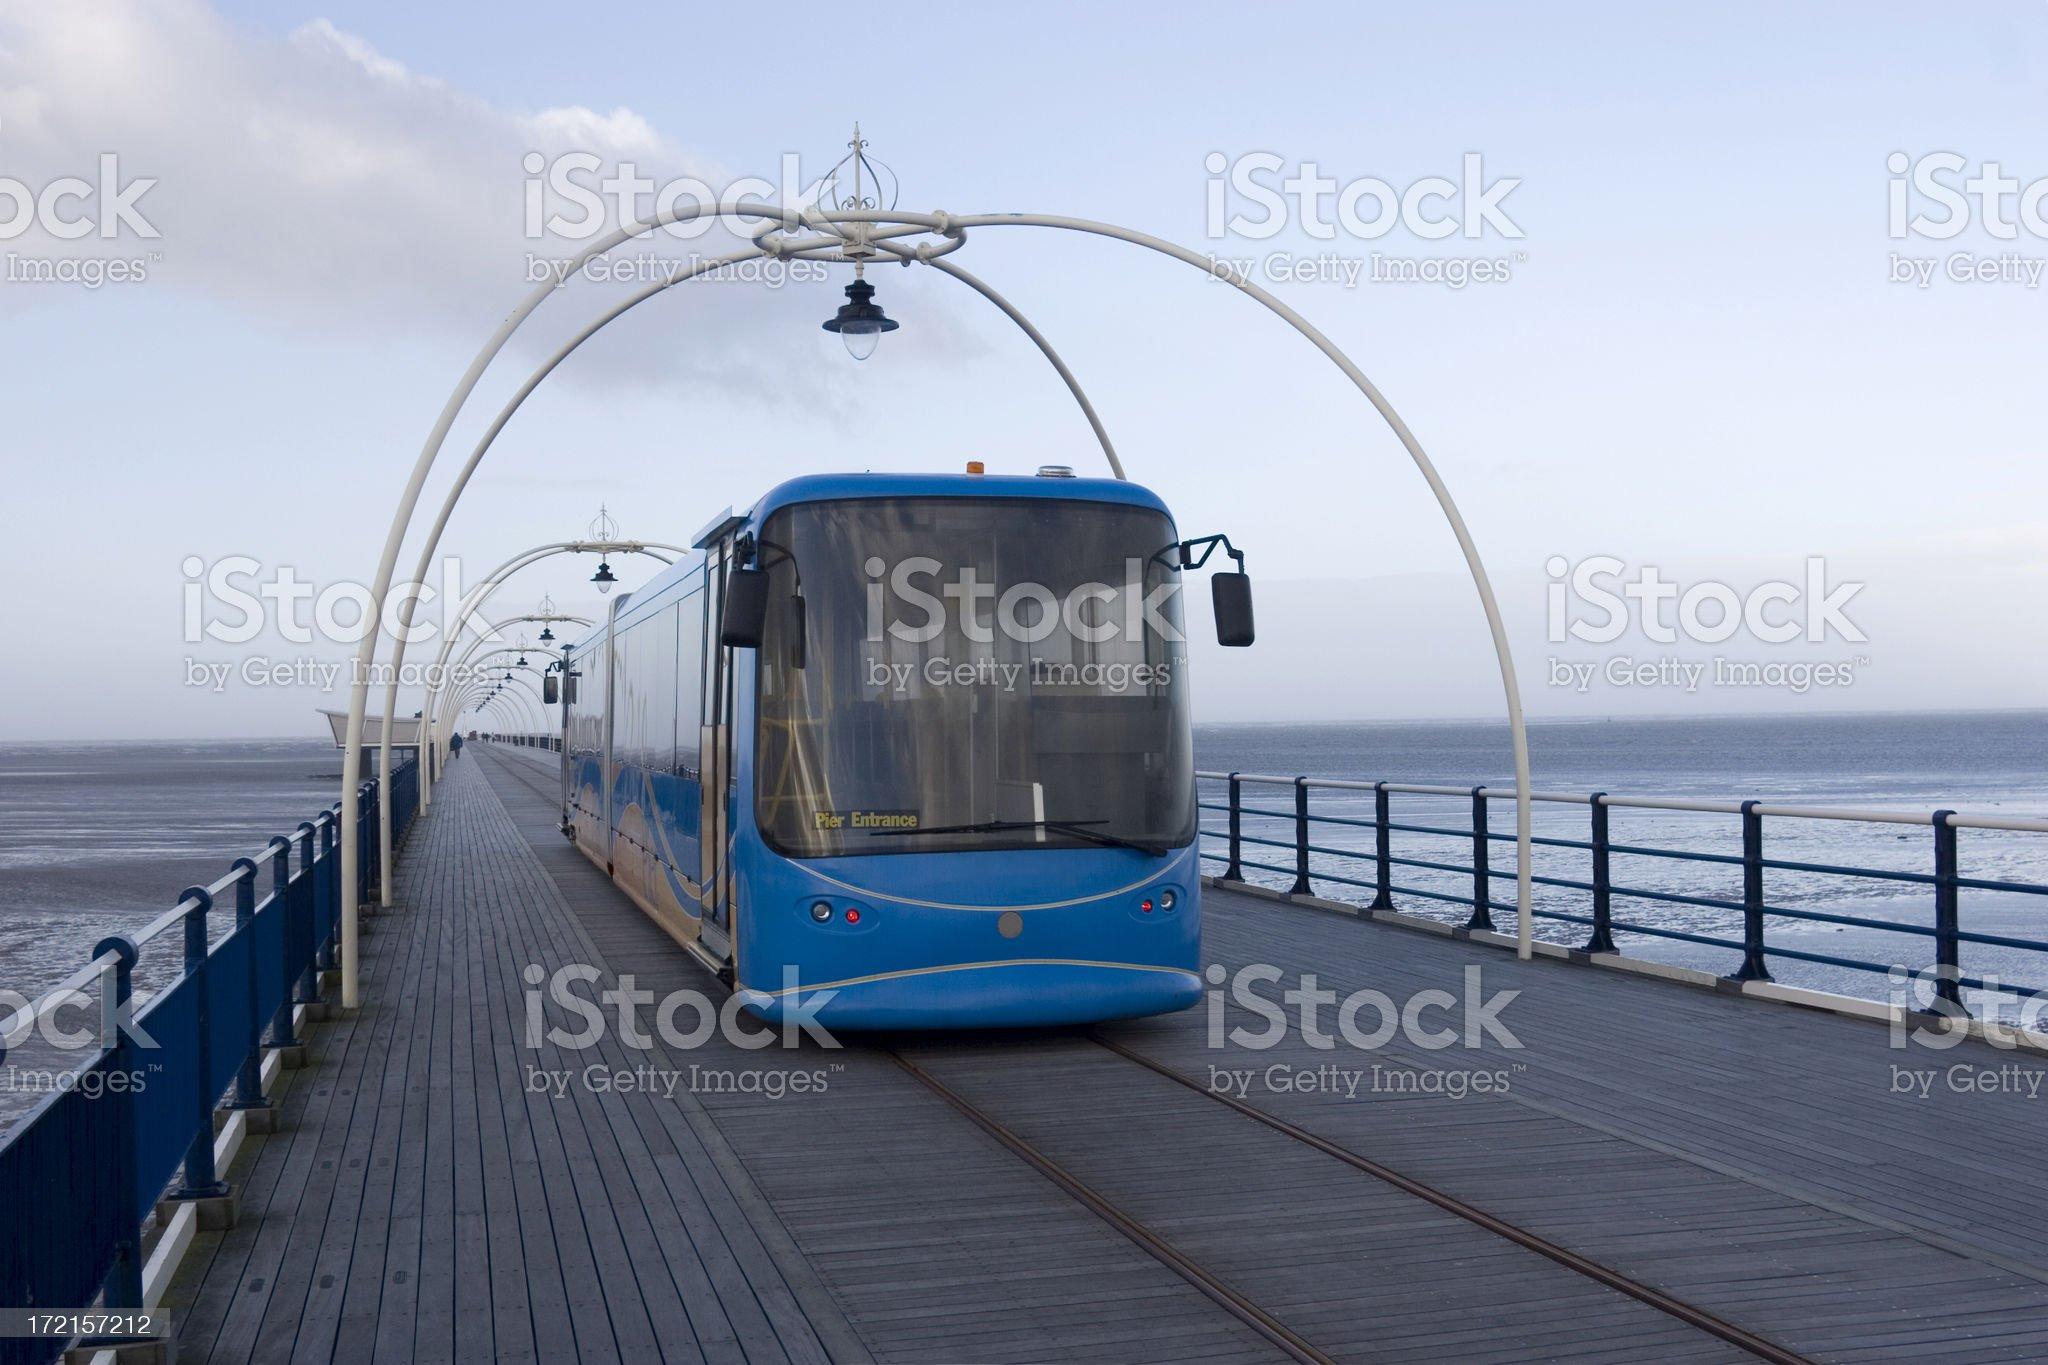 British seaside pier with light railway royalty-free stock photo